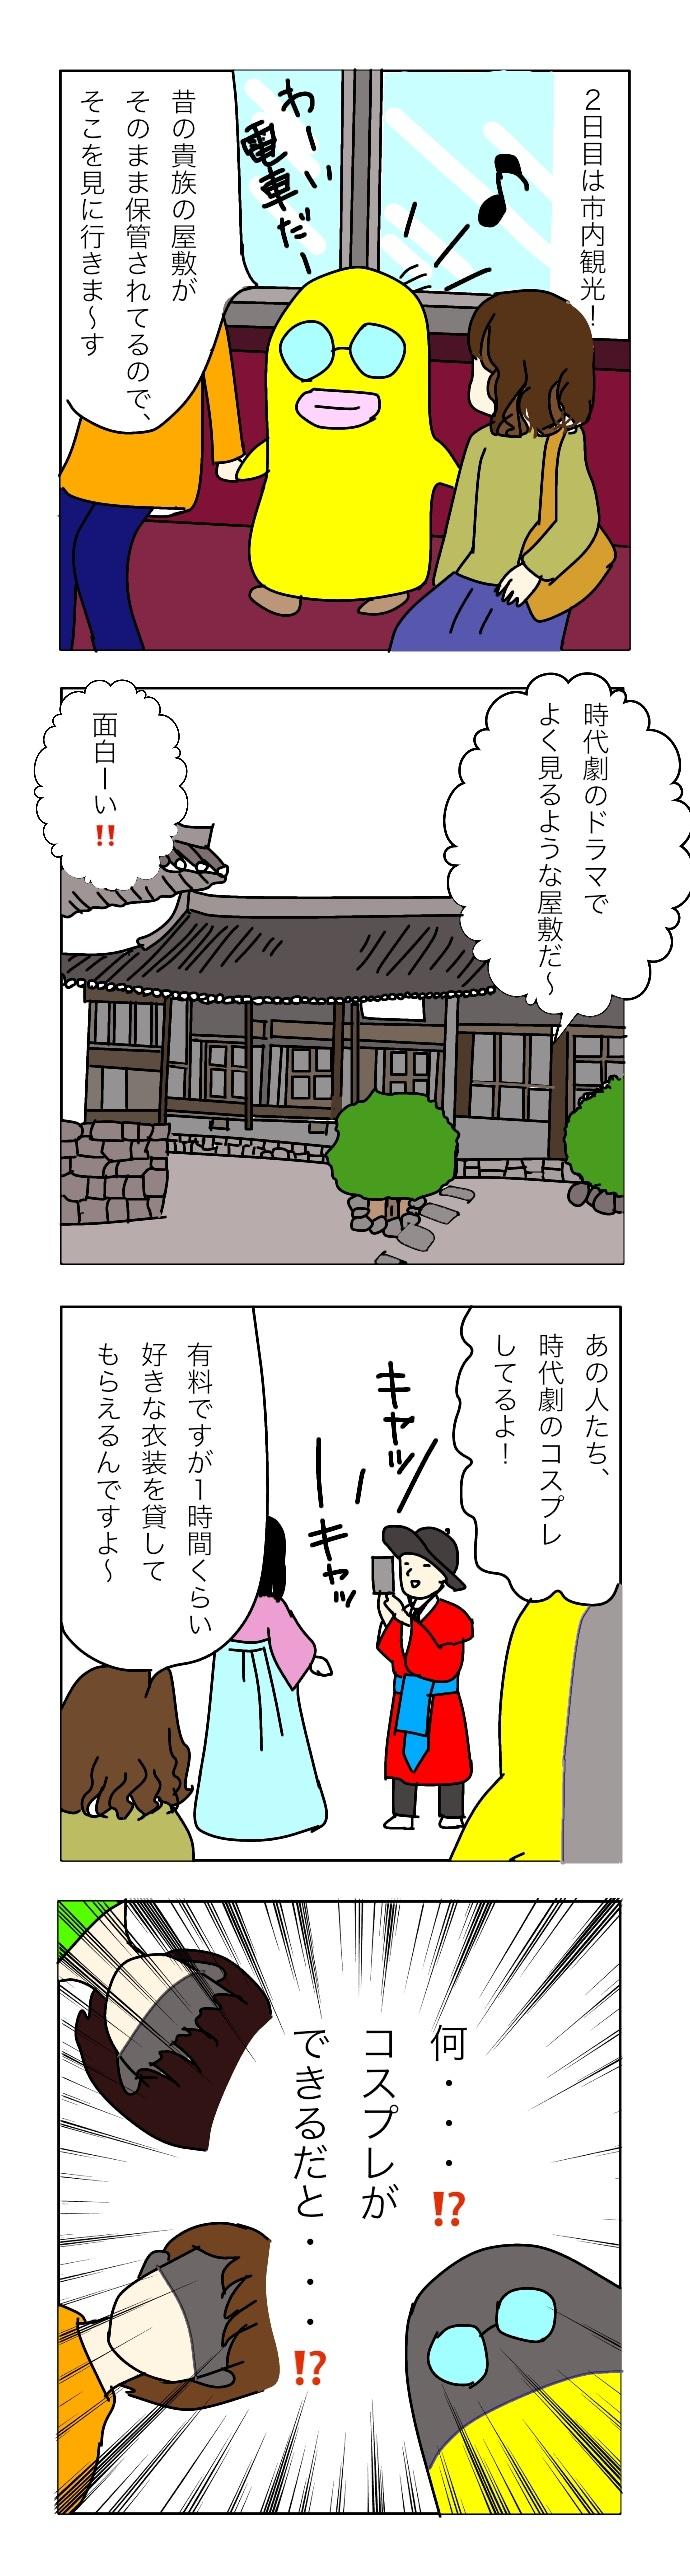 kankoku5 コスプレ